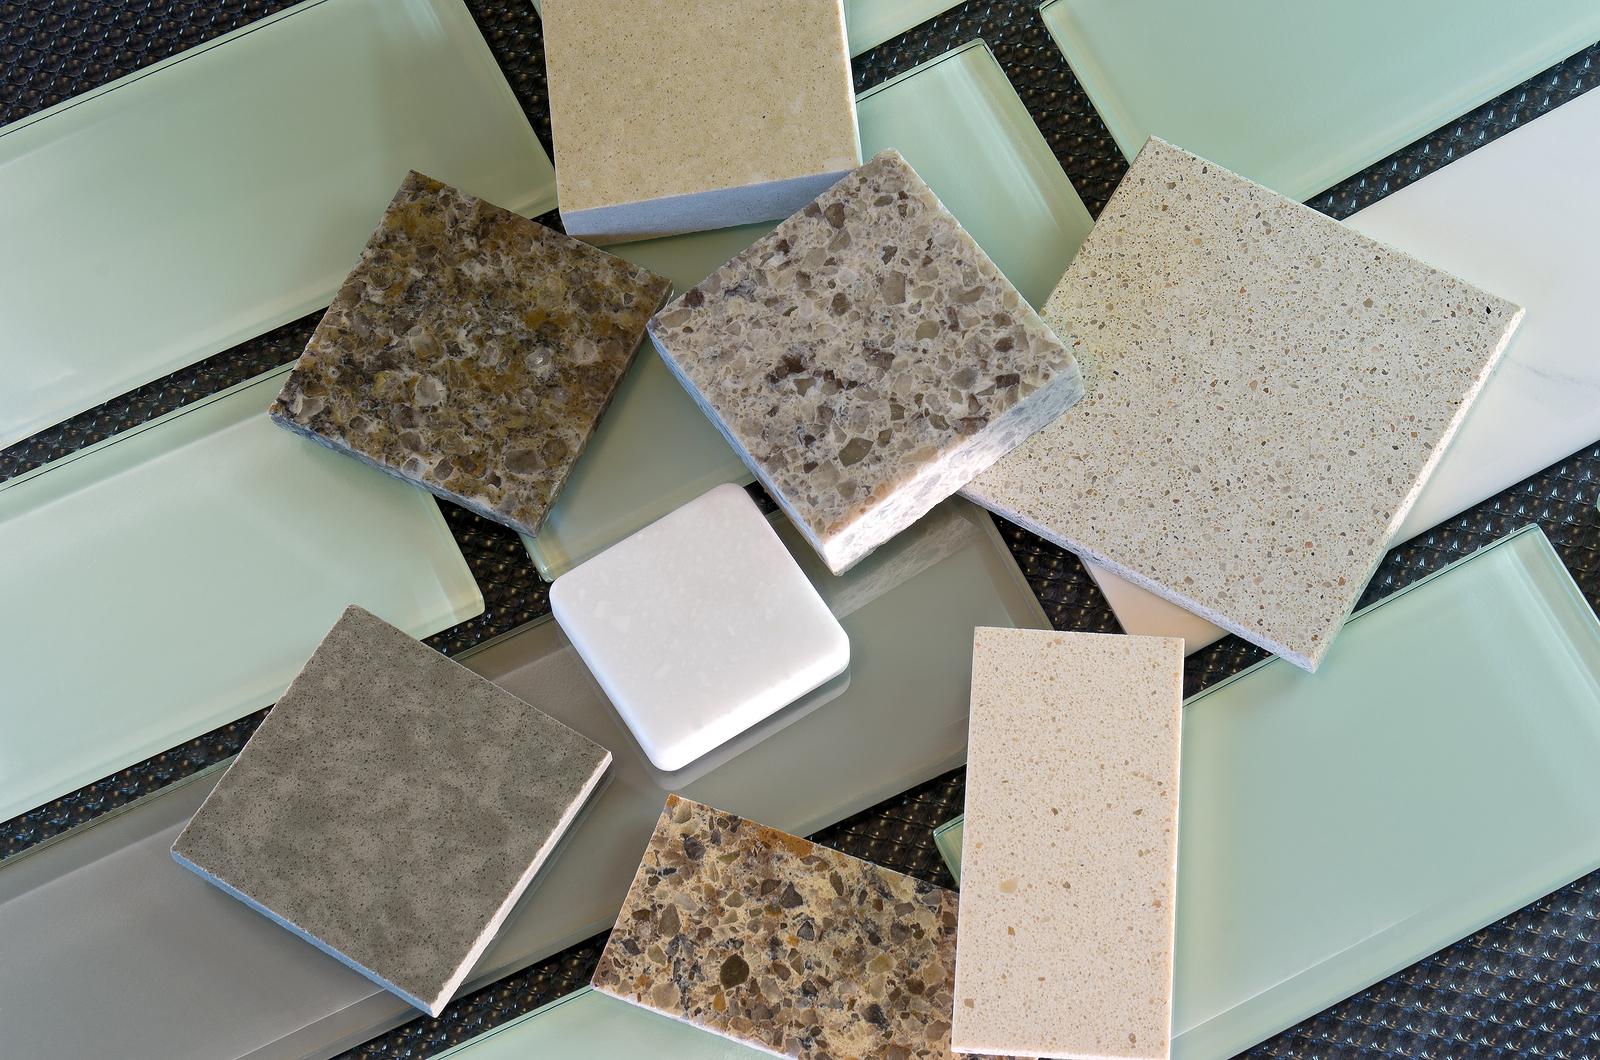 Kitchen Countertops Longmont Remodel | KBC Remodeling Services